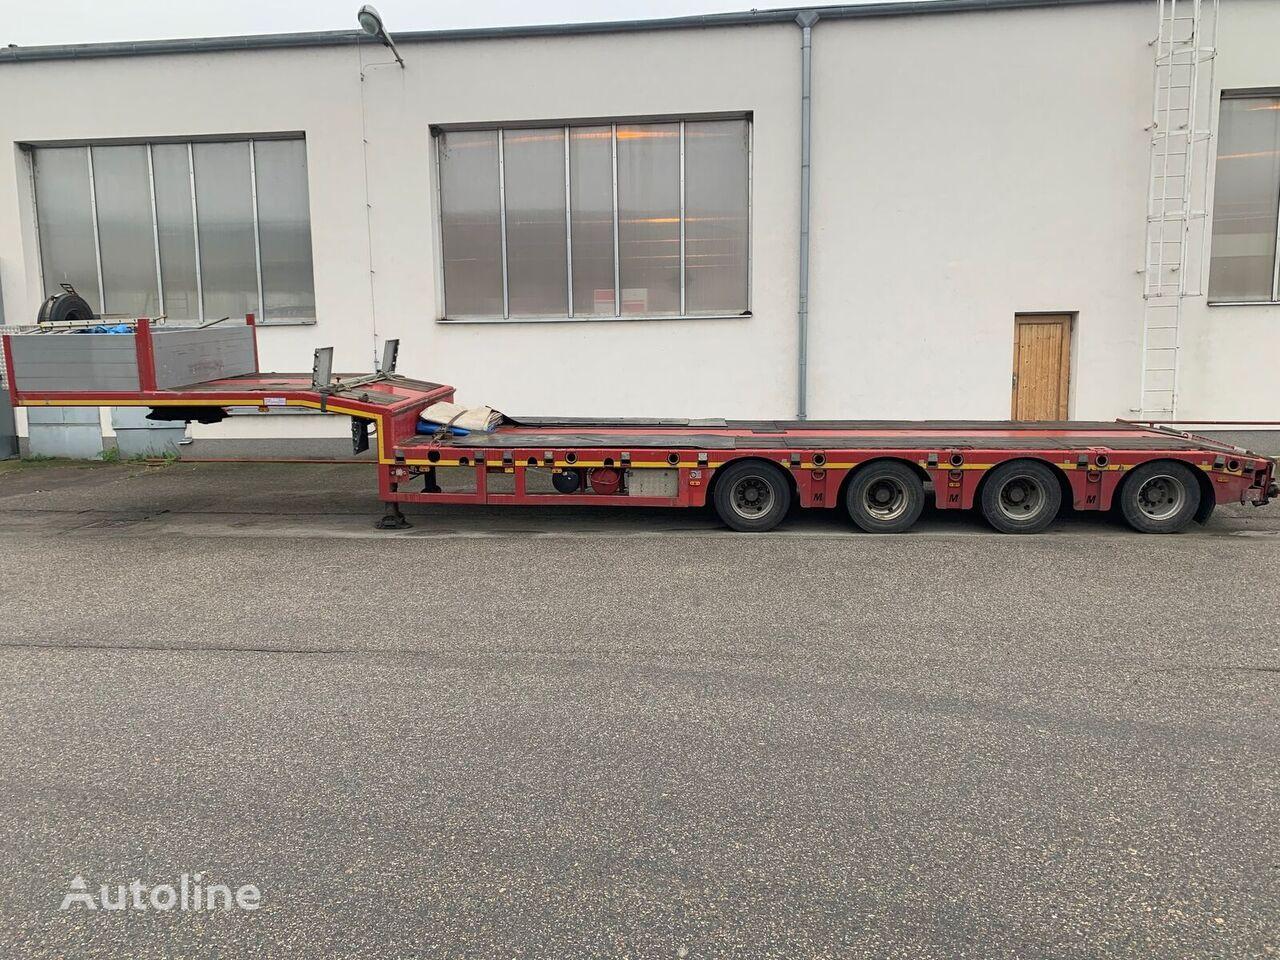 MÖSLEIN STT 4  -  4 axles telescopic, extendable low bed semi-trailer